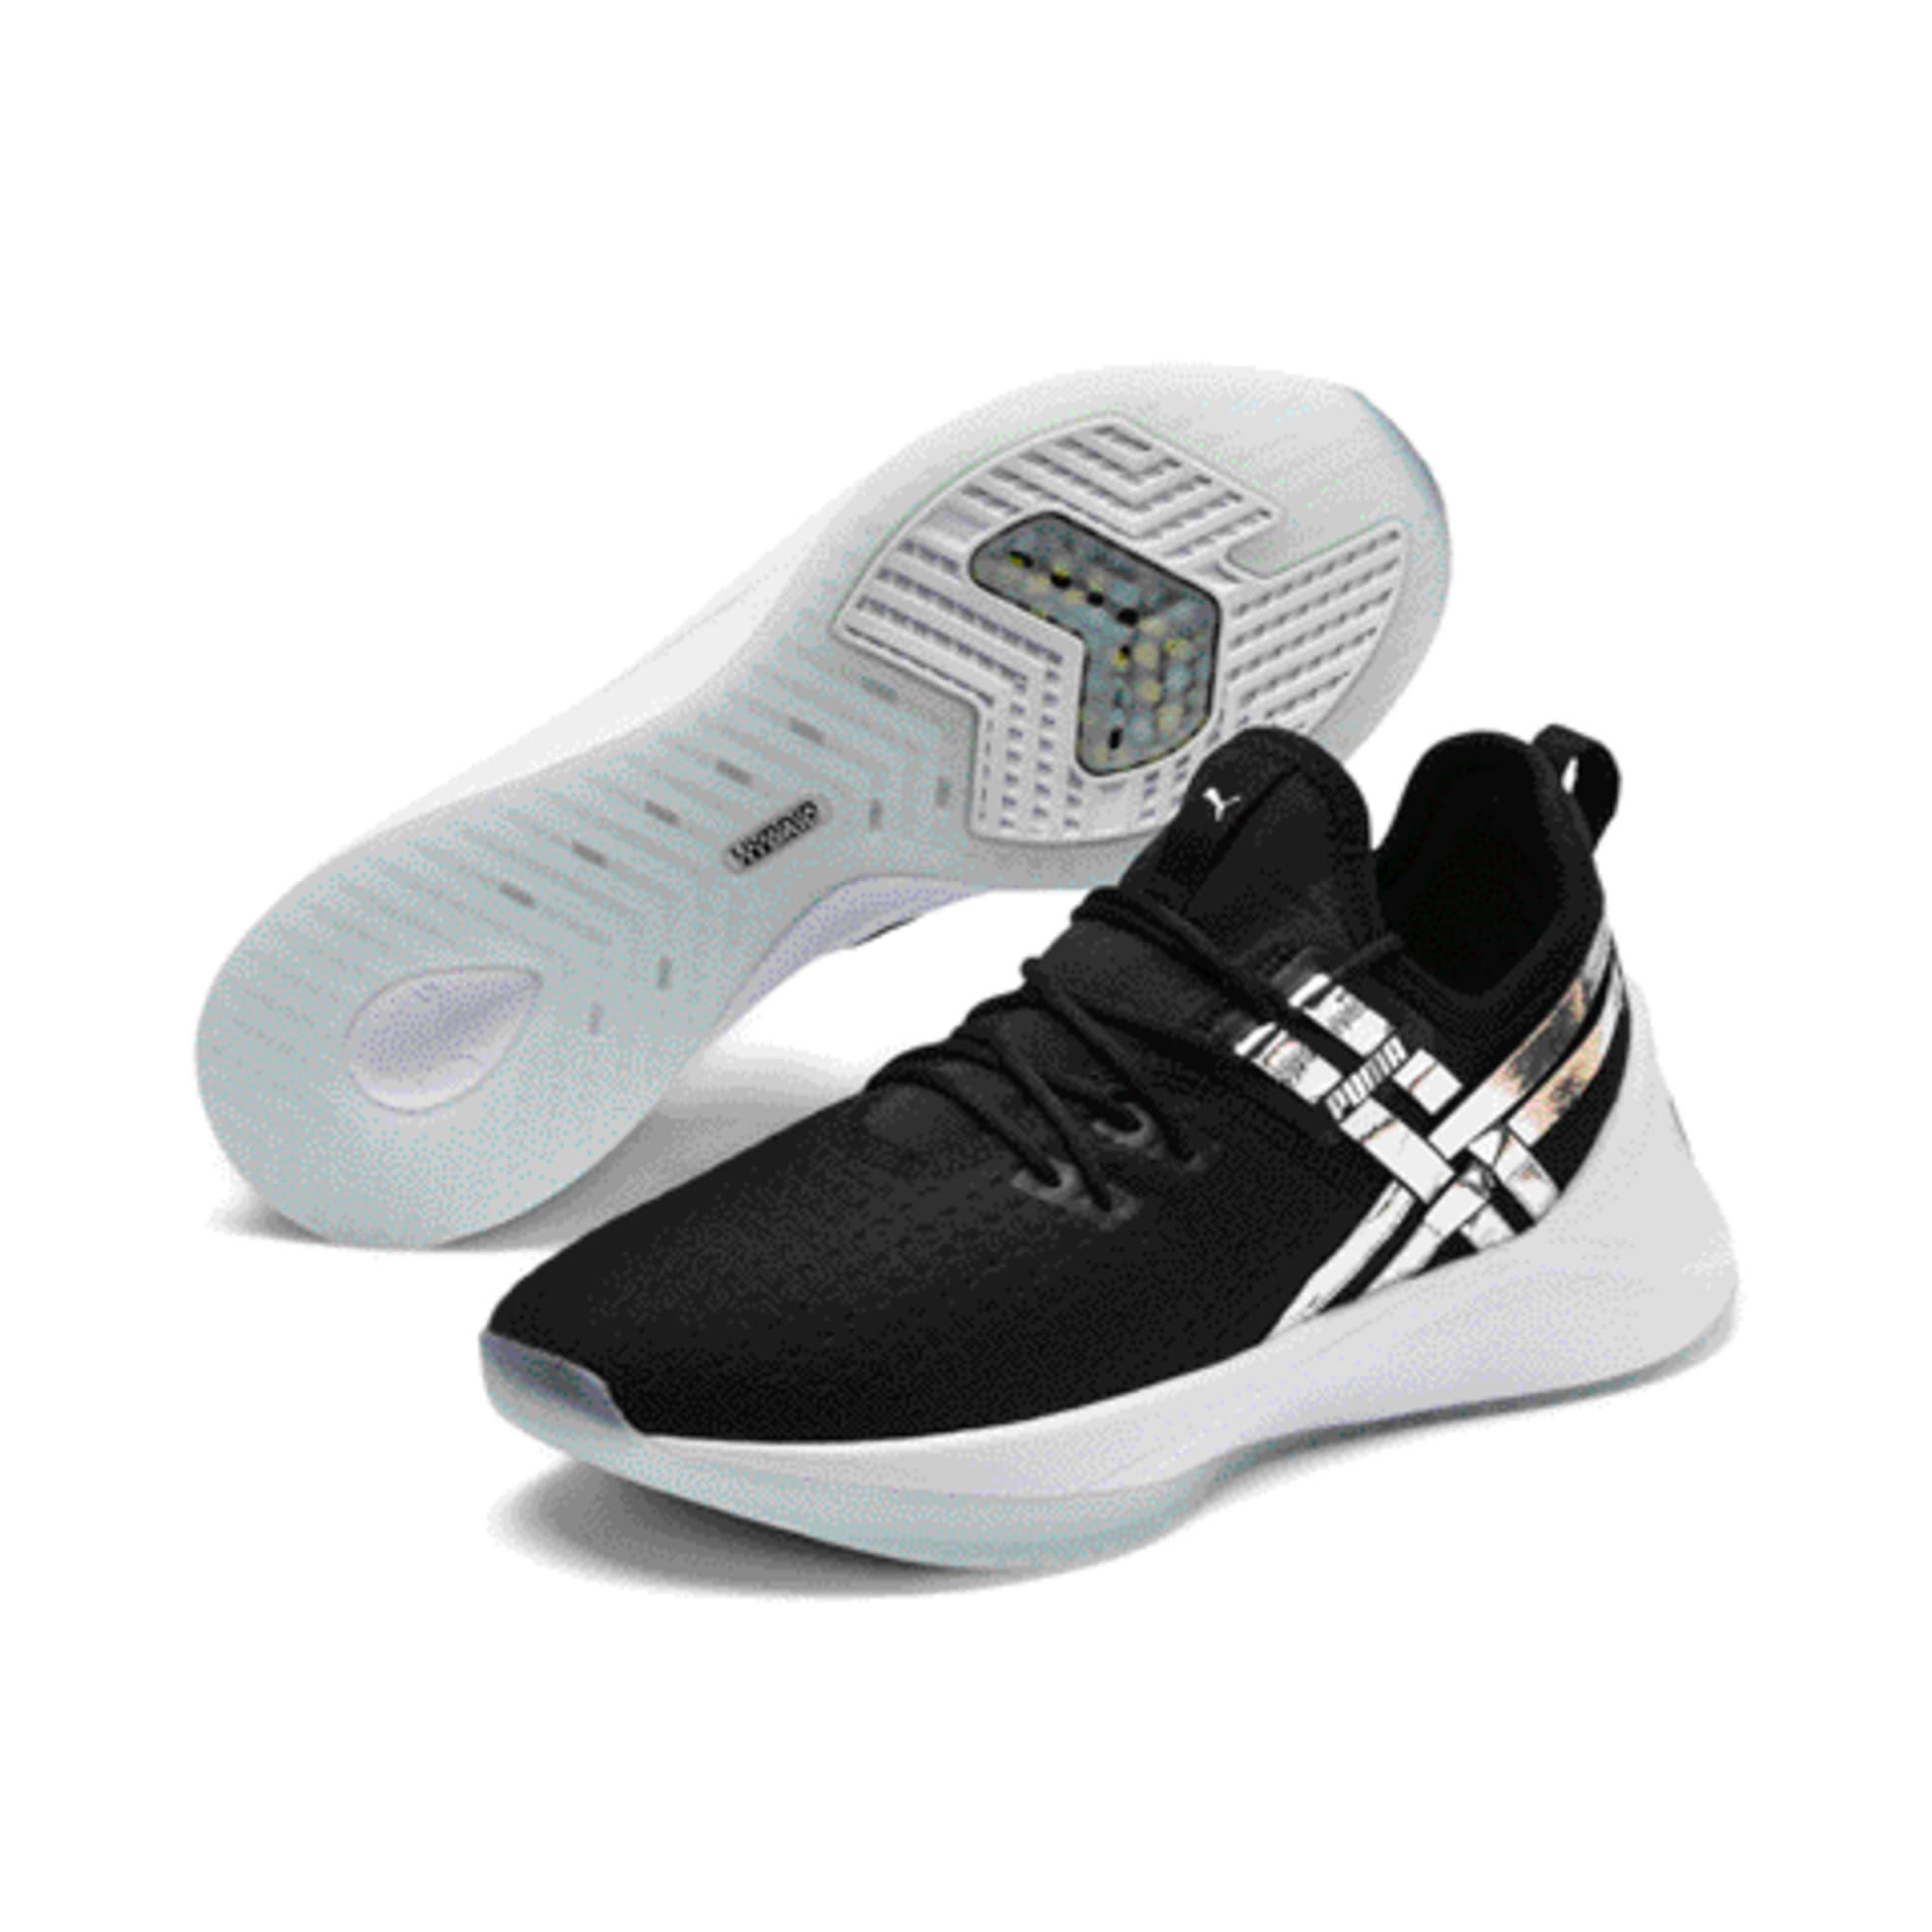 Thumbnail 2 of Jaab XT Trailblazer Women's Training Shoes, Puma Black-Fair Aqua, medium